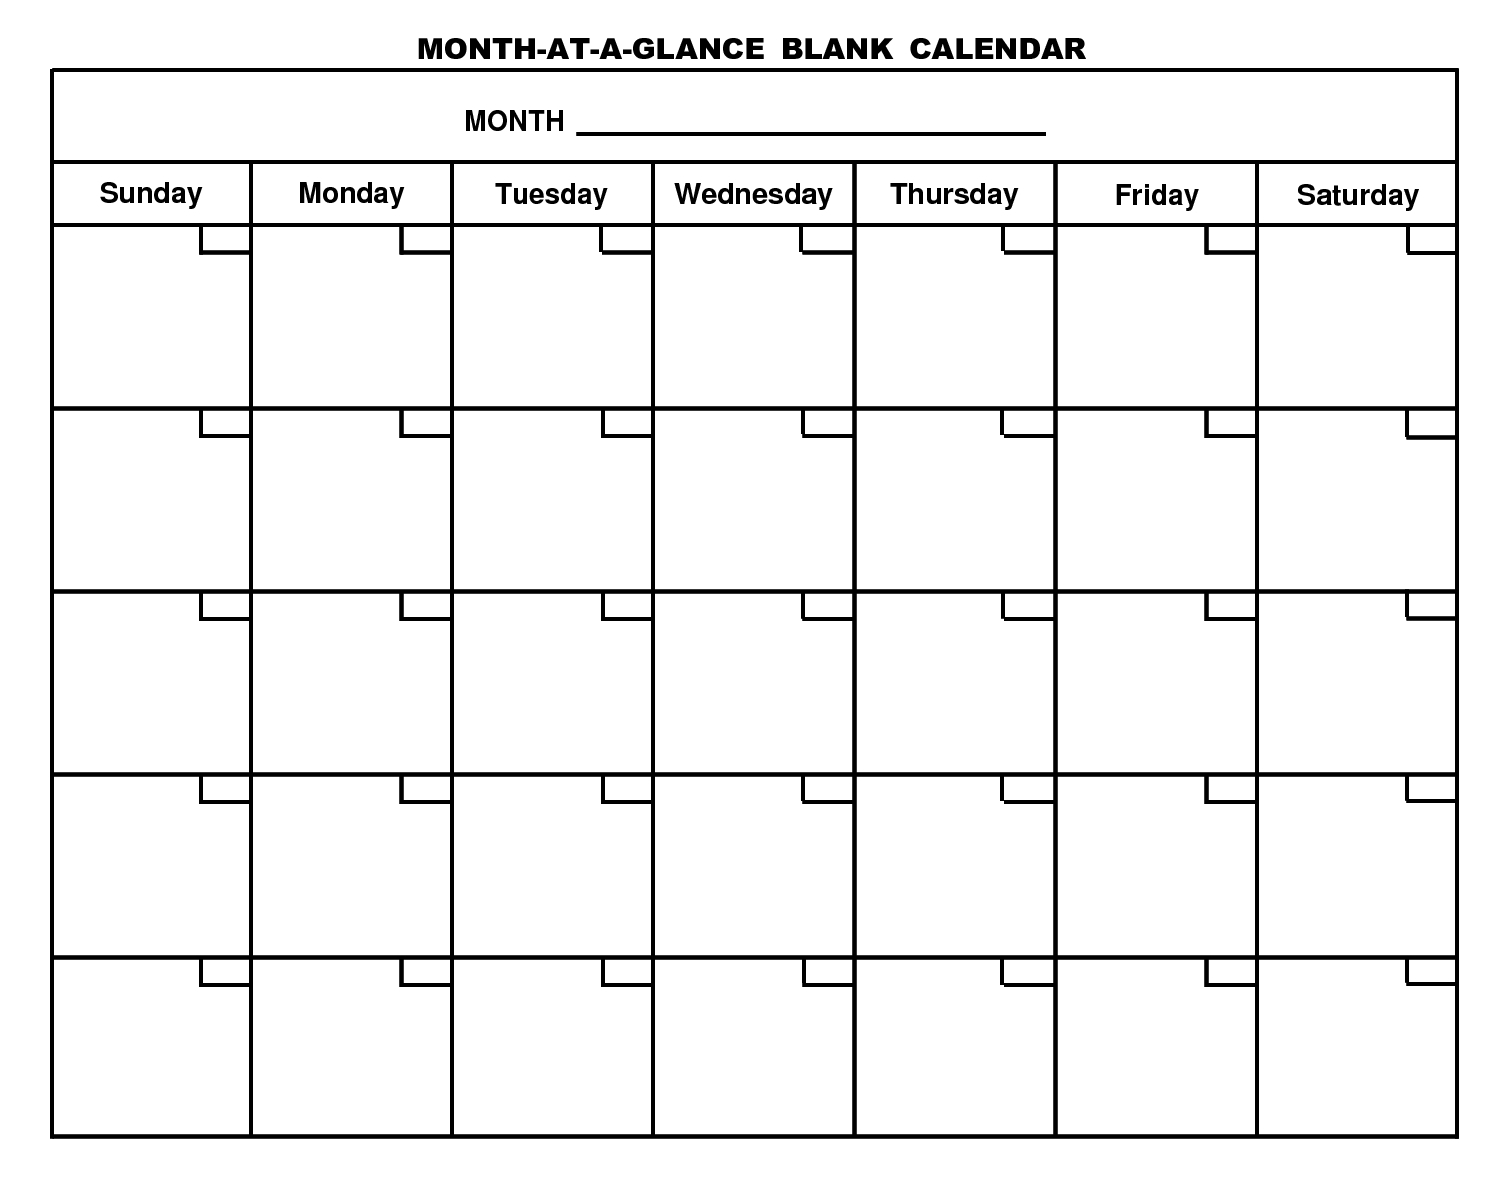 Impressive Blank Calendar 1 Month • Printable Blank Calendar Template in 1 Month Calendar Printable Blank